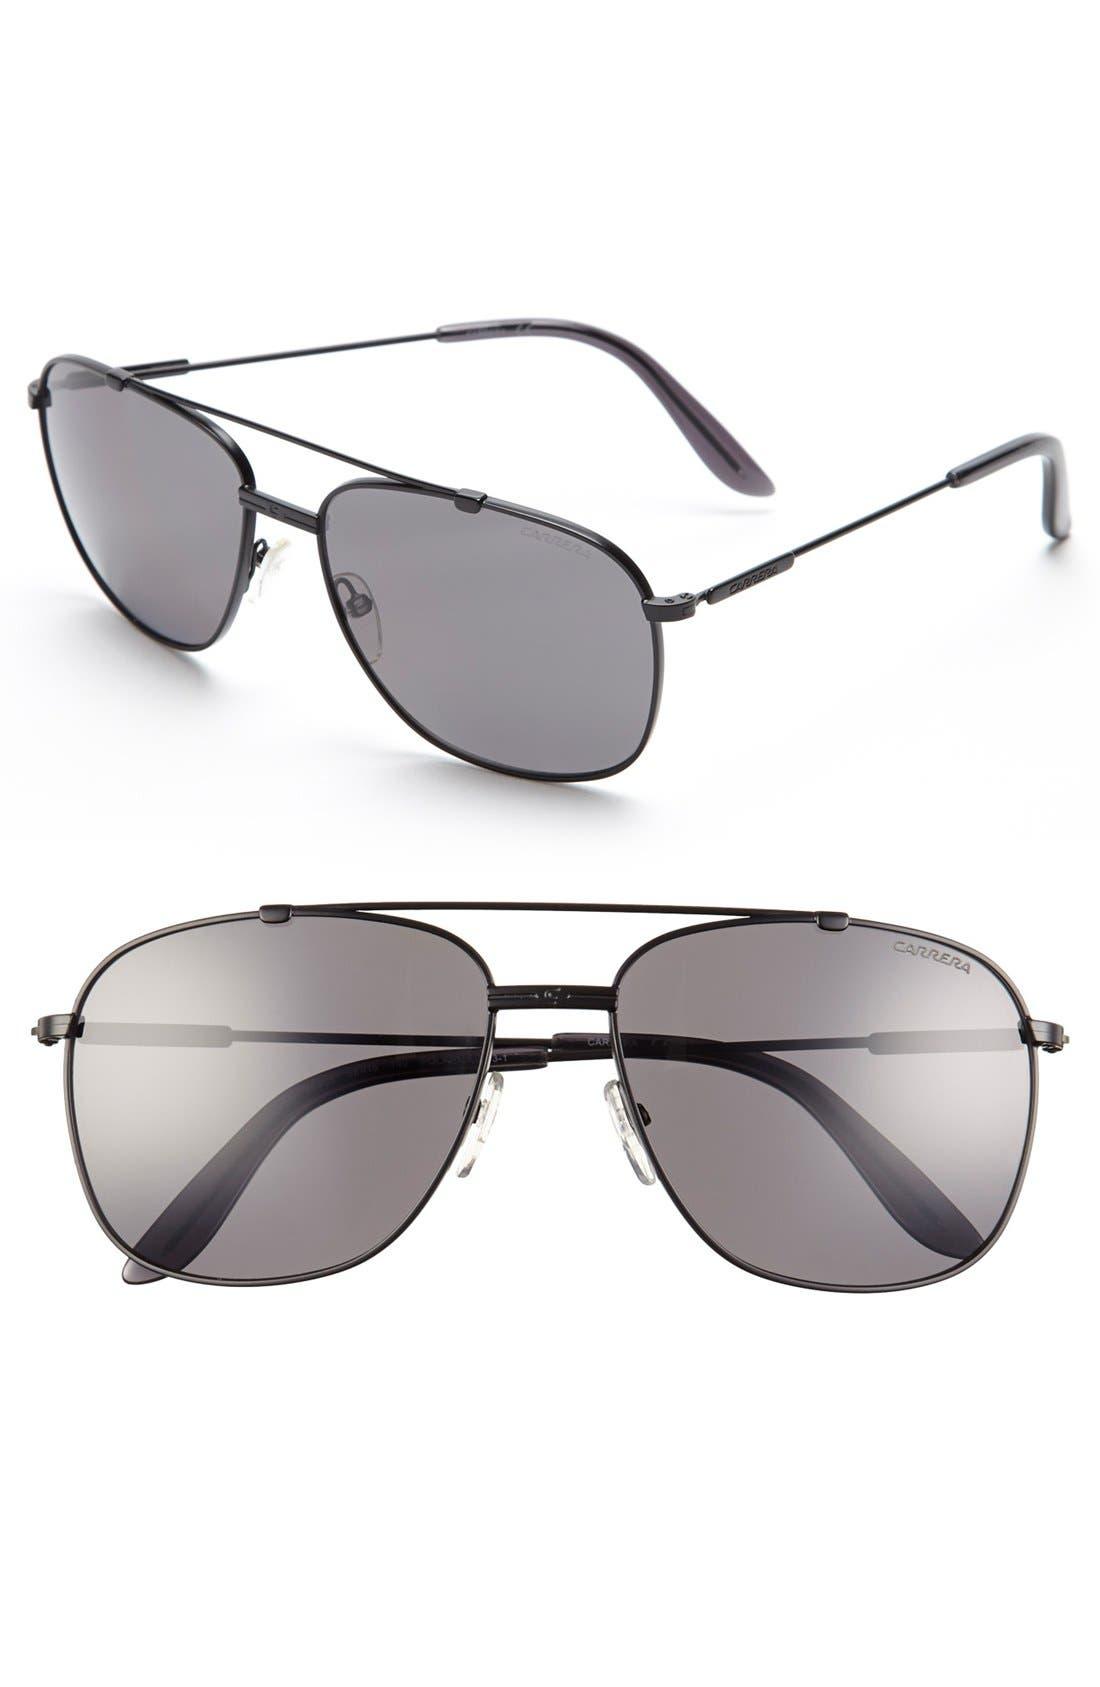 Alternate Image 1 Selected - Carrera Eyewear 58mm Aviator Sunglasses